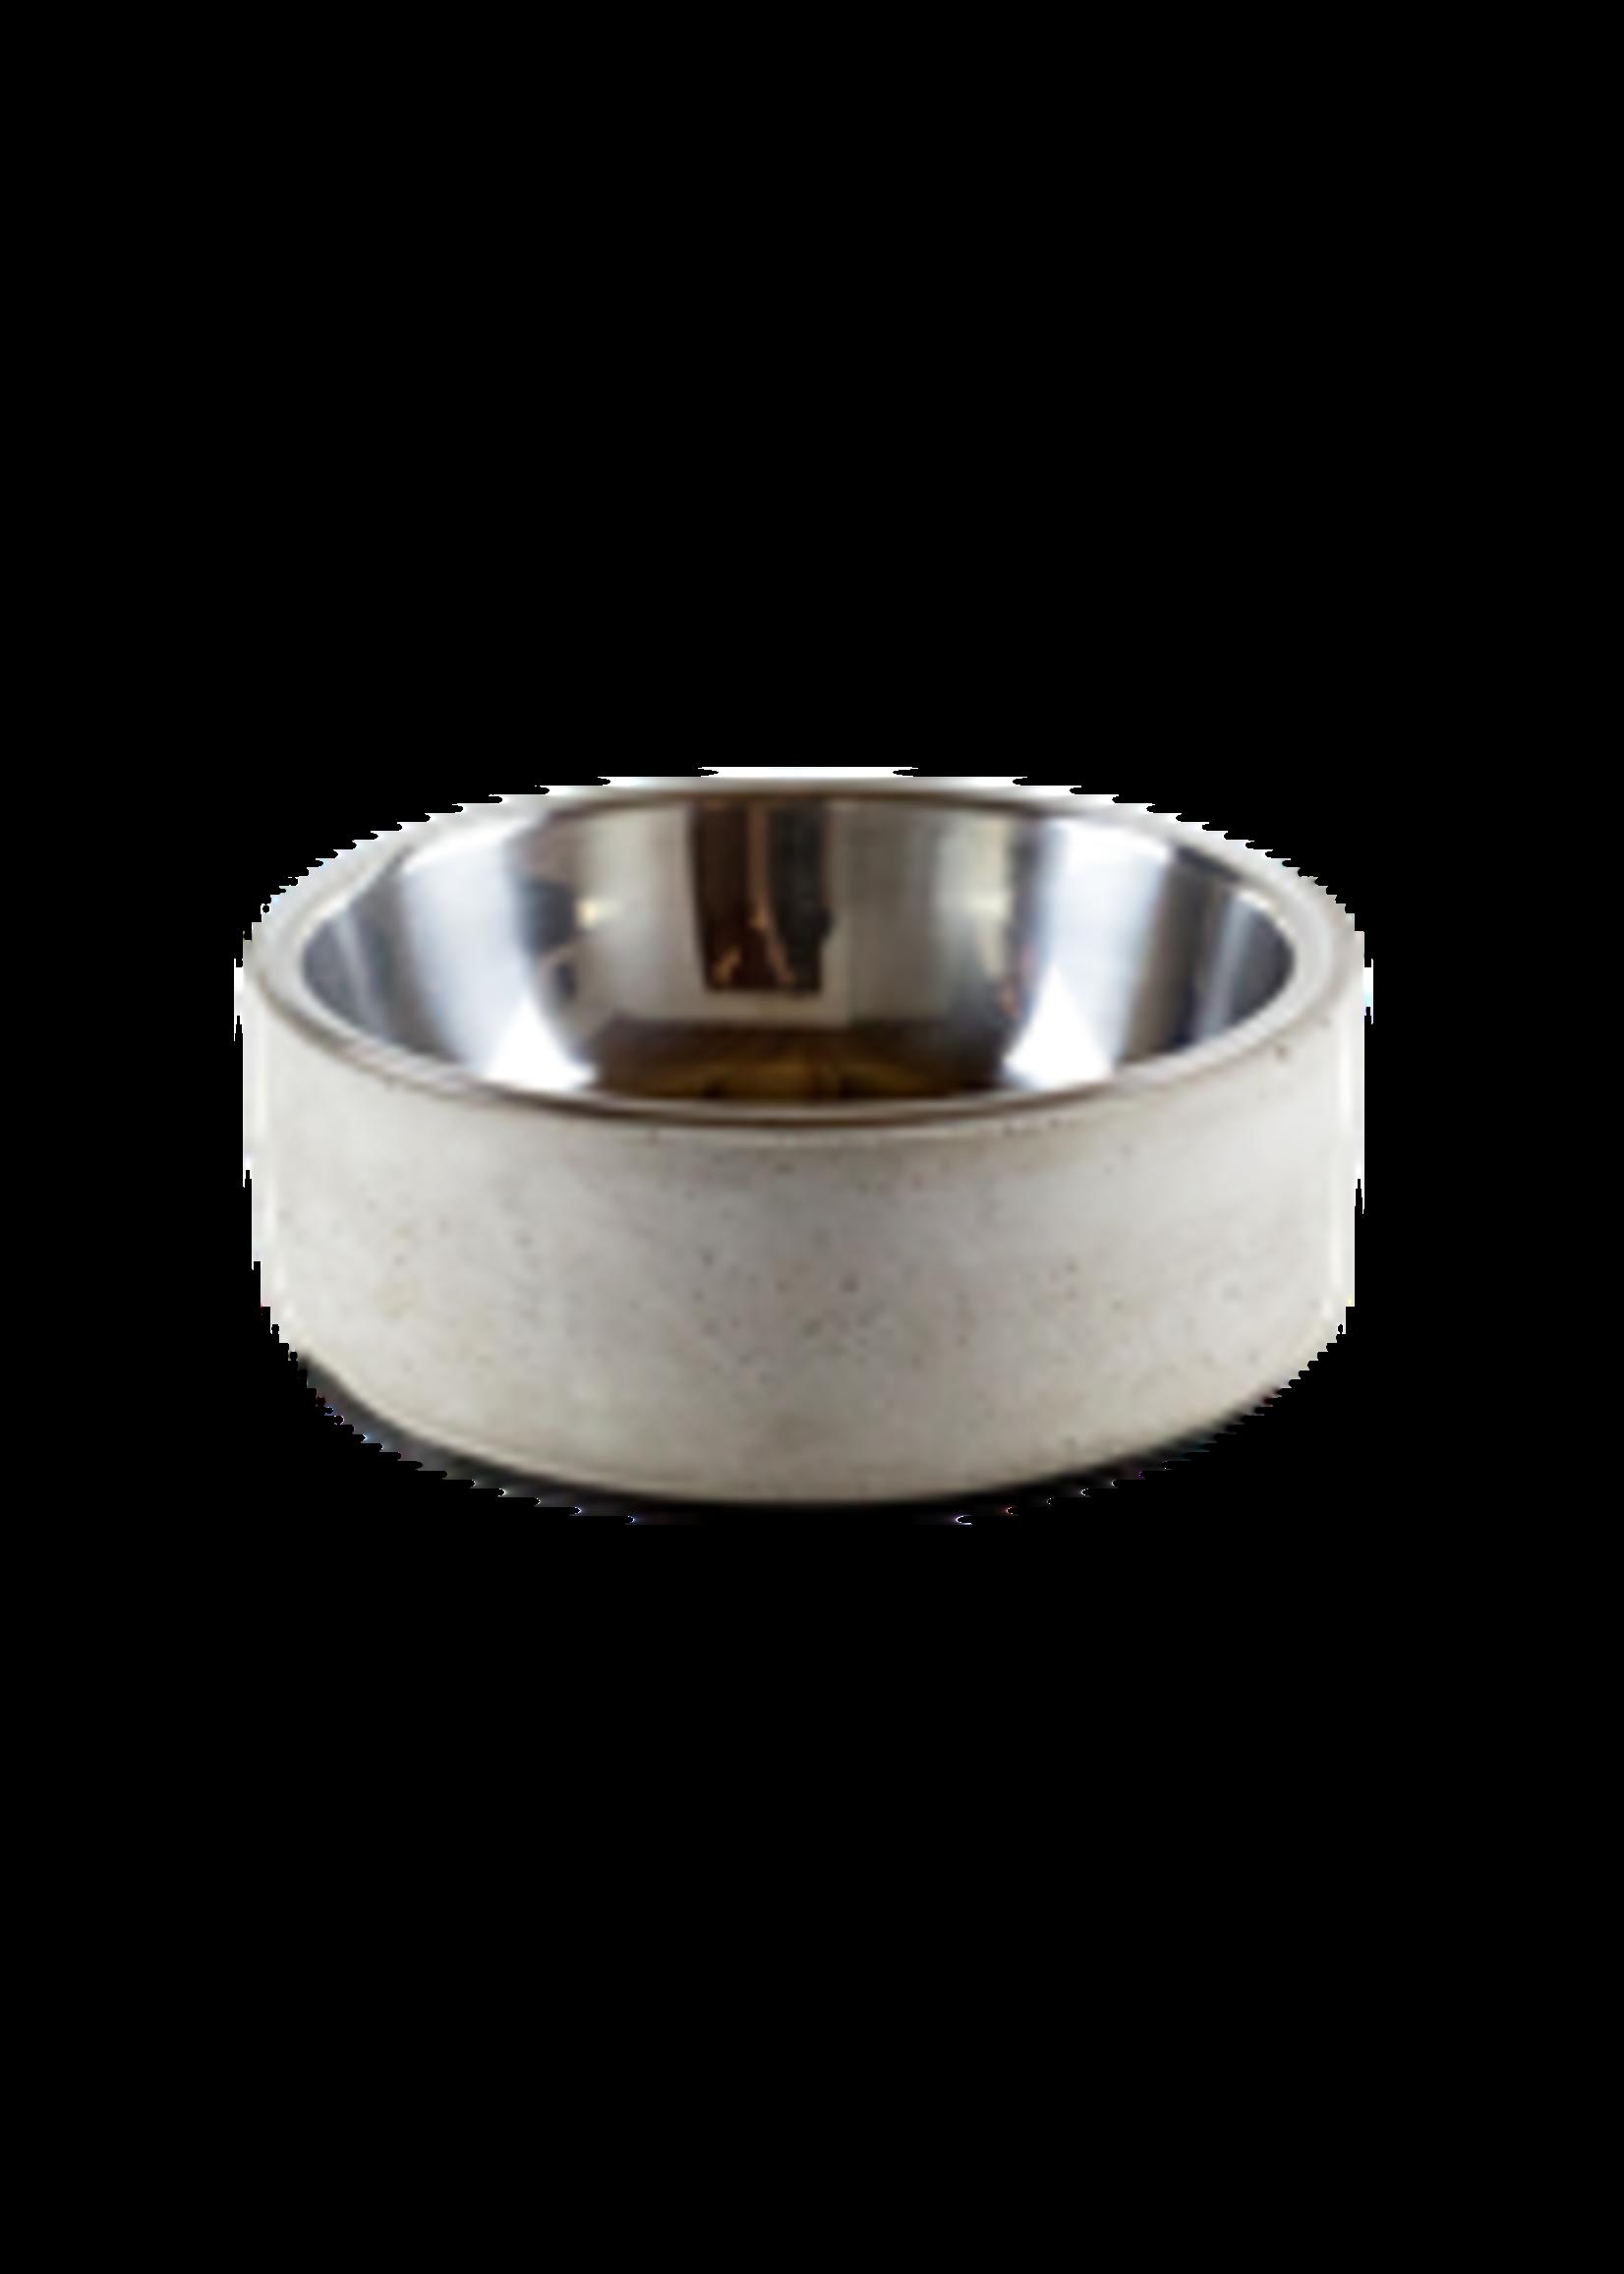 BeOneBreed™ Concrete Bowl Large